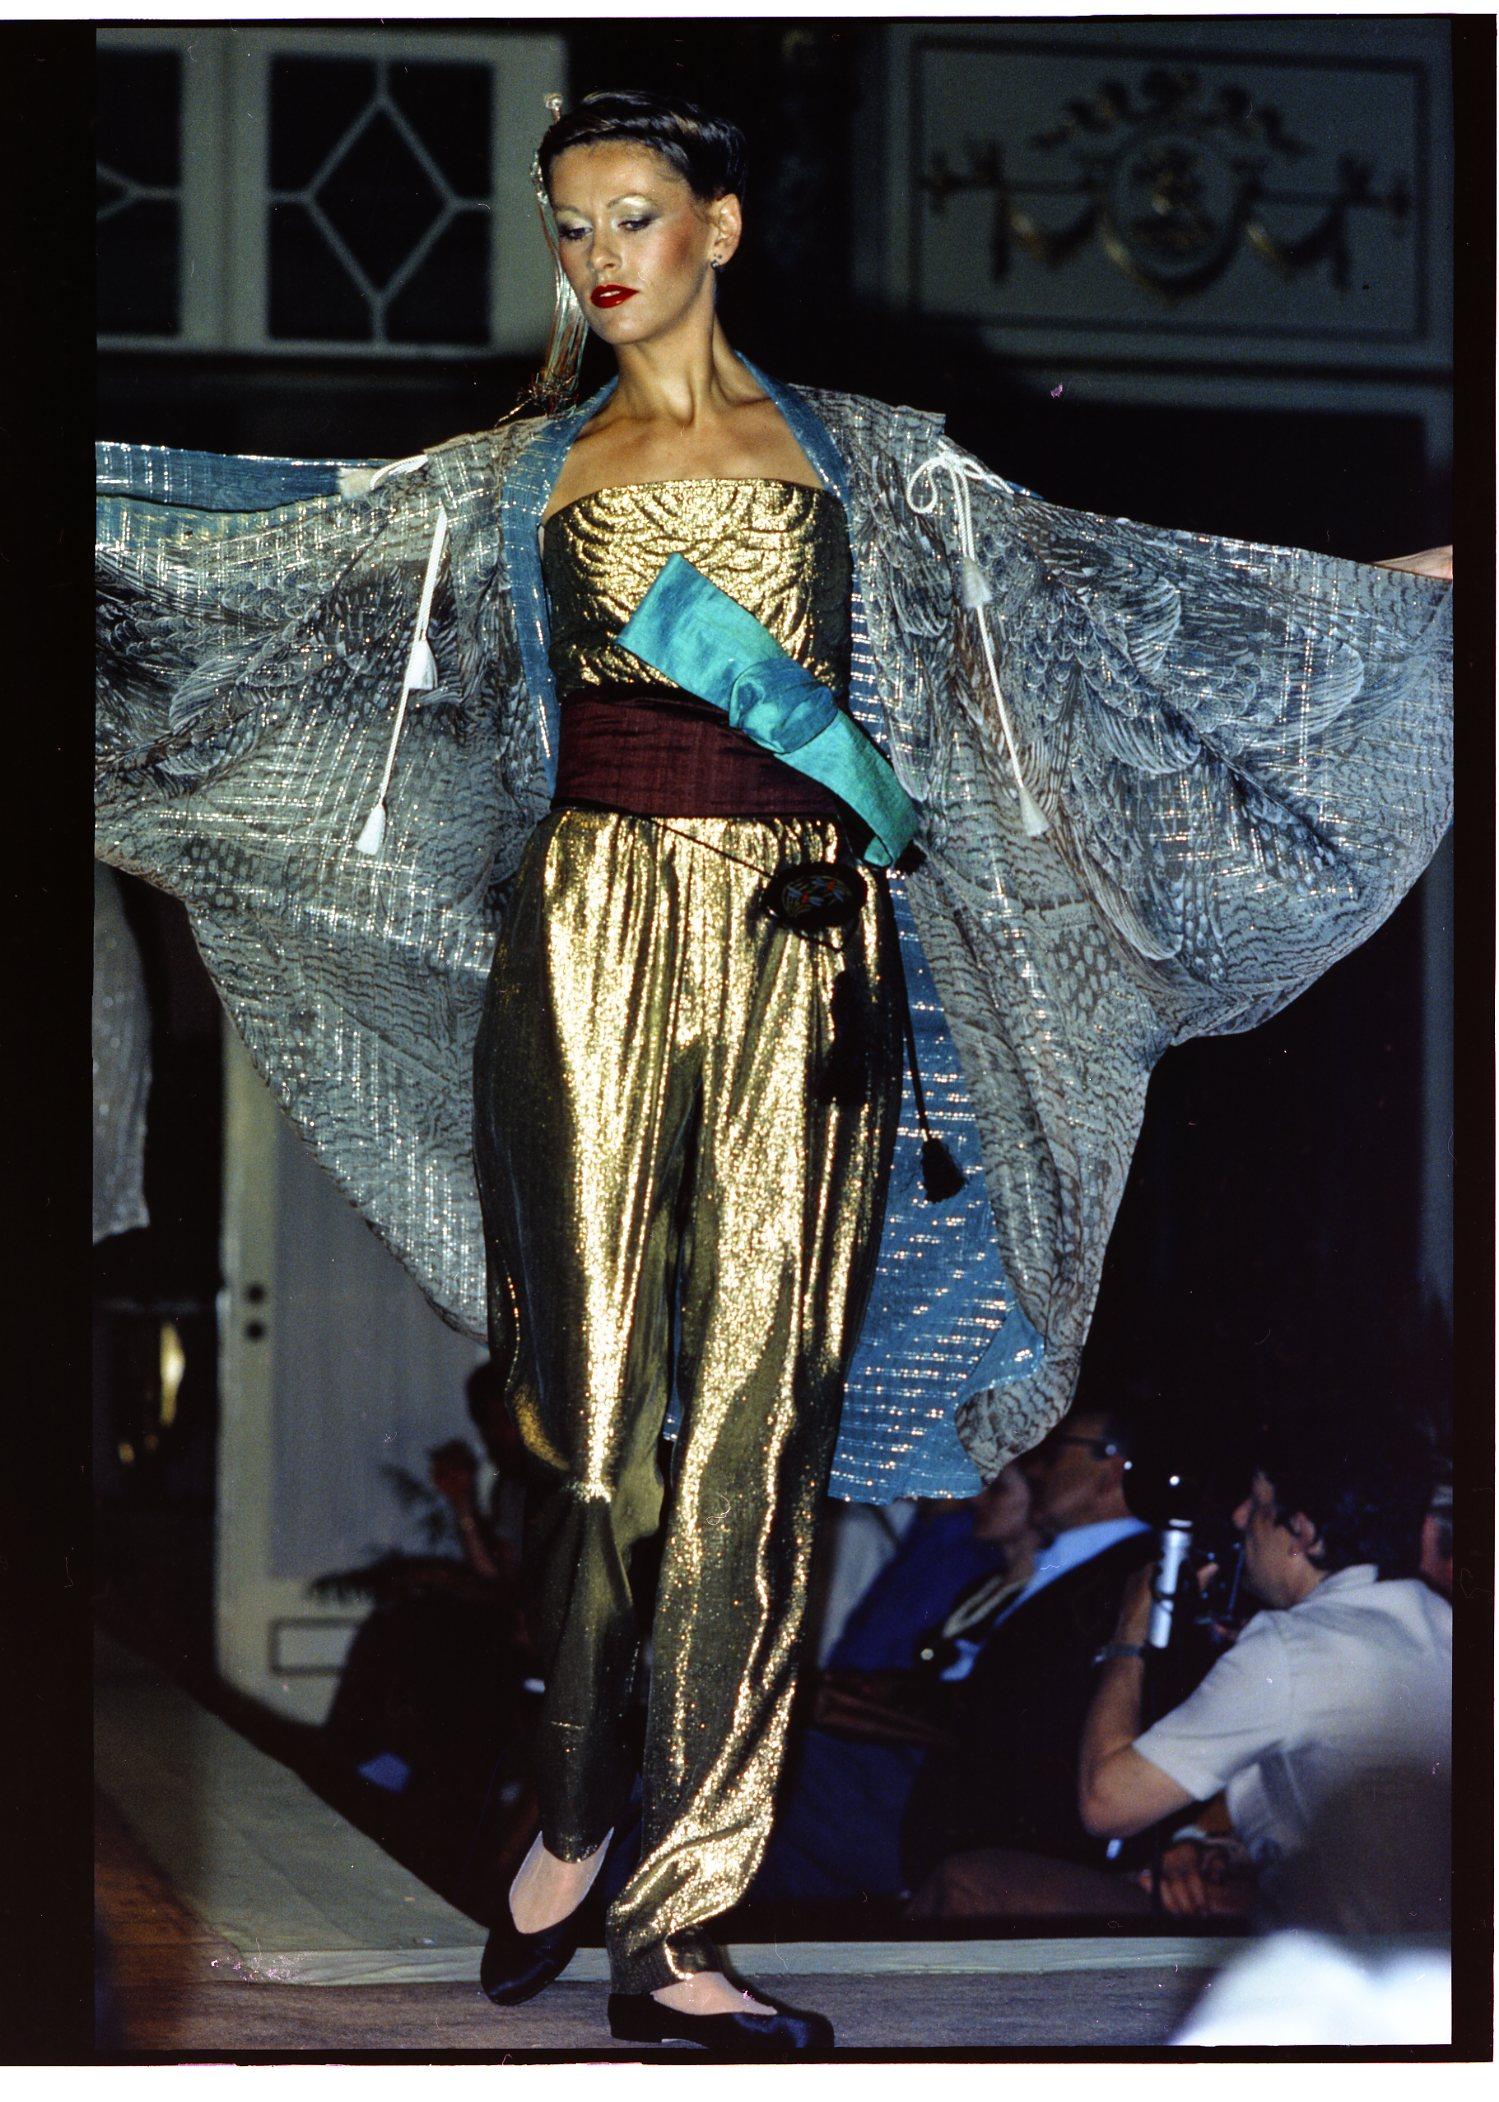 Showing in Rome at Alta Moda, 1978. Courtesy of Hiroko Koshino.